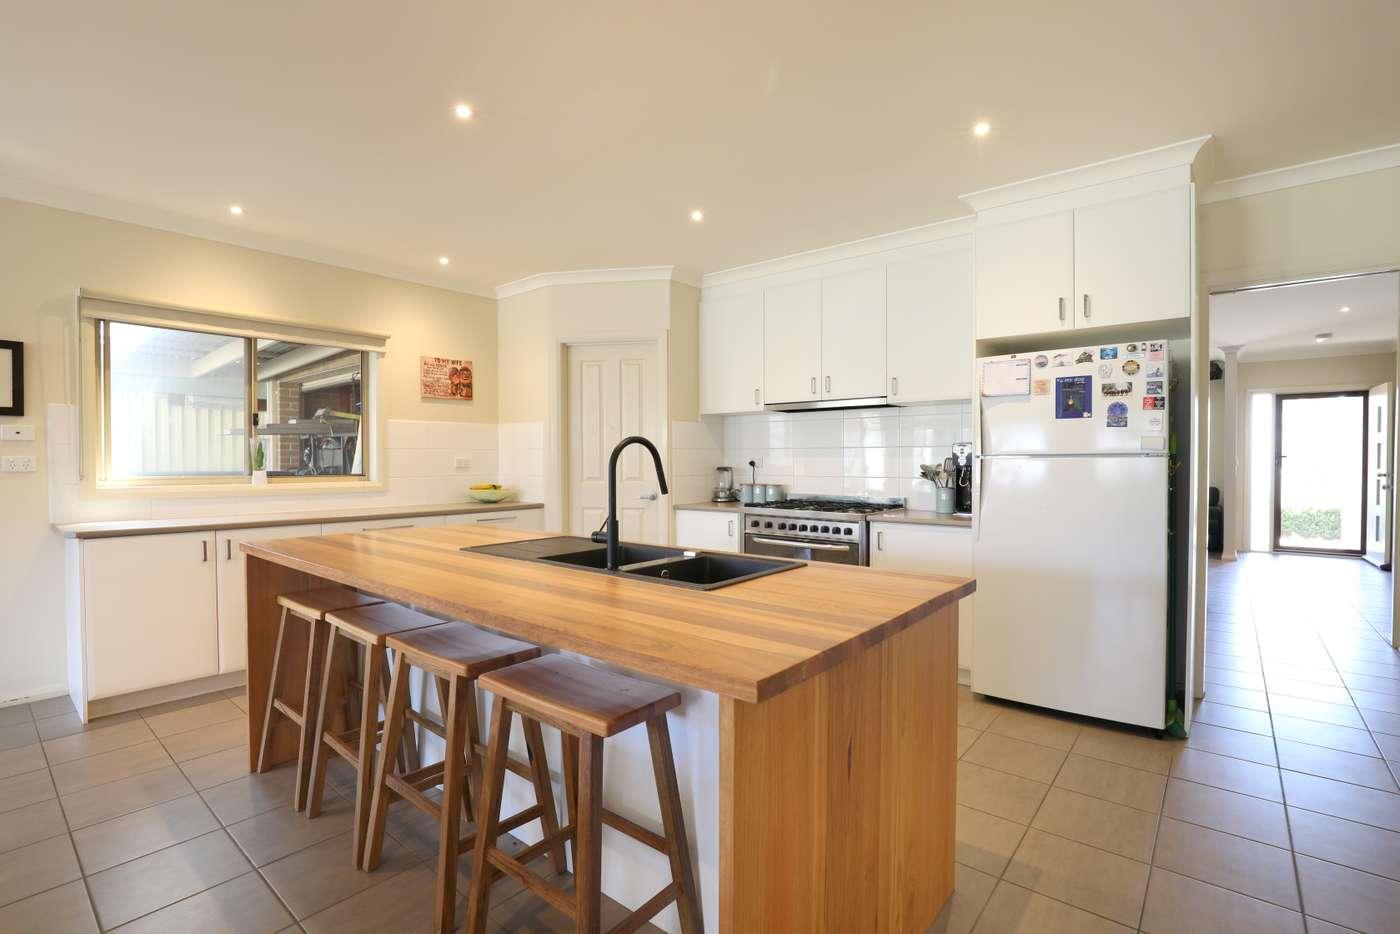 Main view of Homely house listing, 6 CORNFLOWER STREET, Pakenham VIC 3810